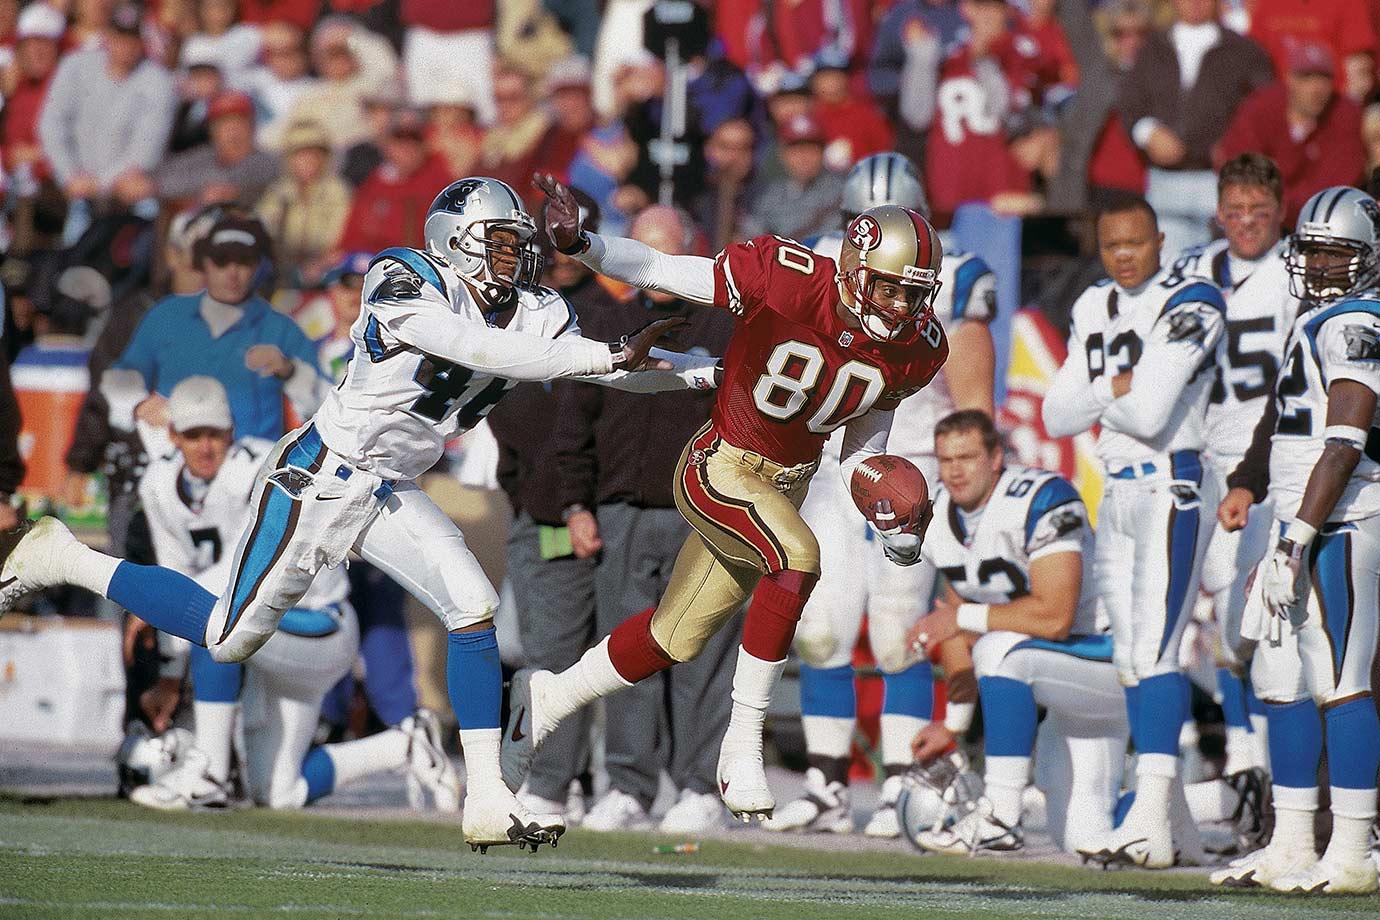 Nov. 8, 1998 — San Francisco 49ers vs. Carolina Panthers